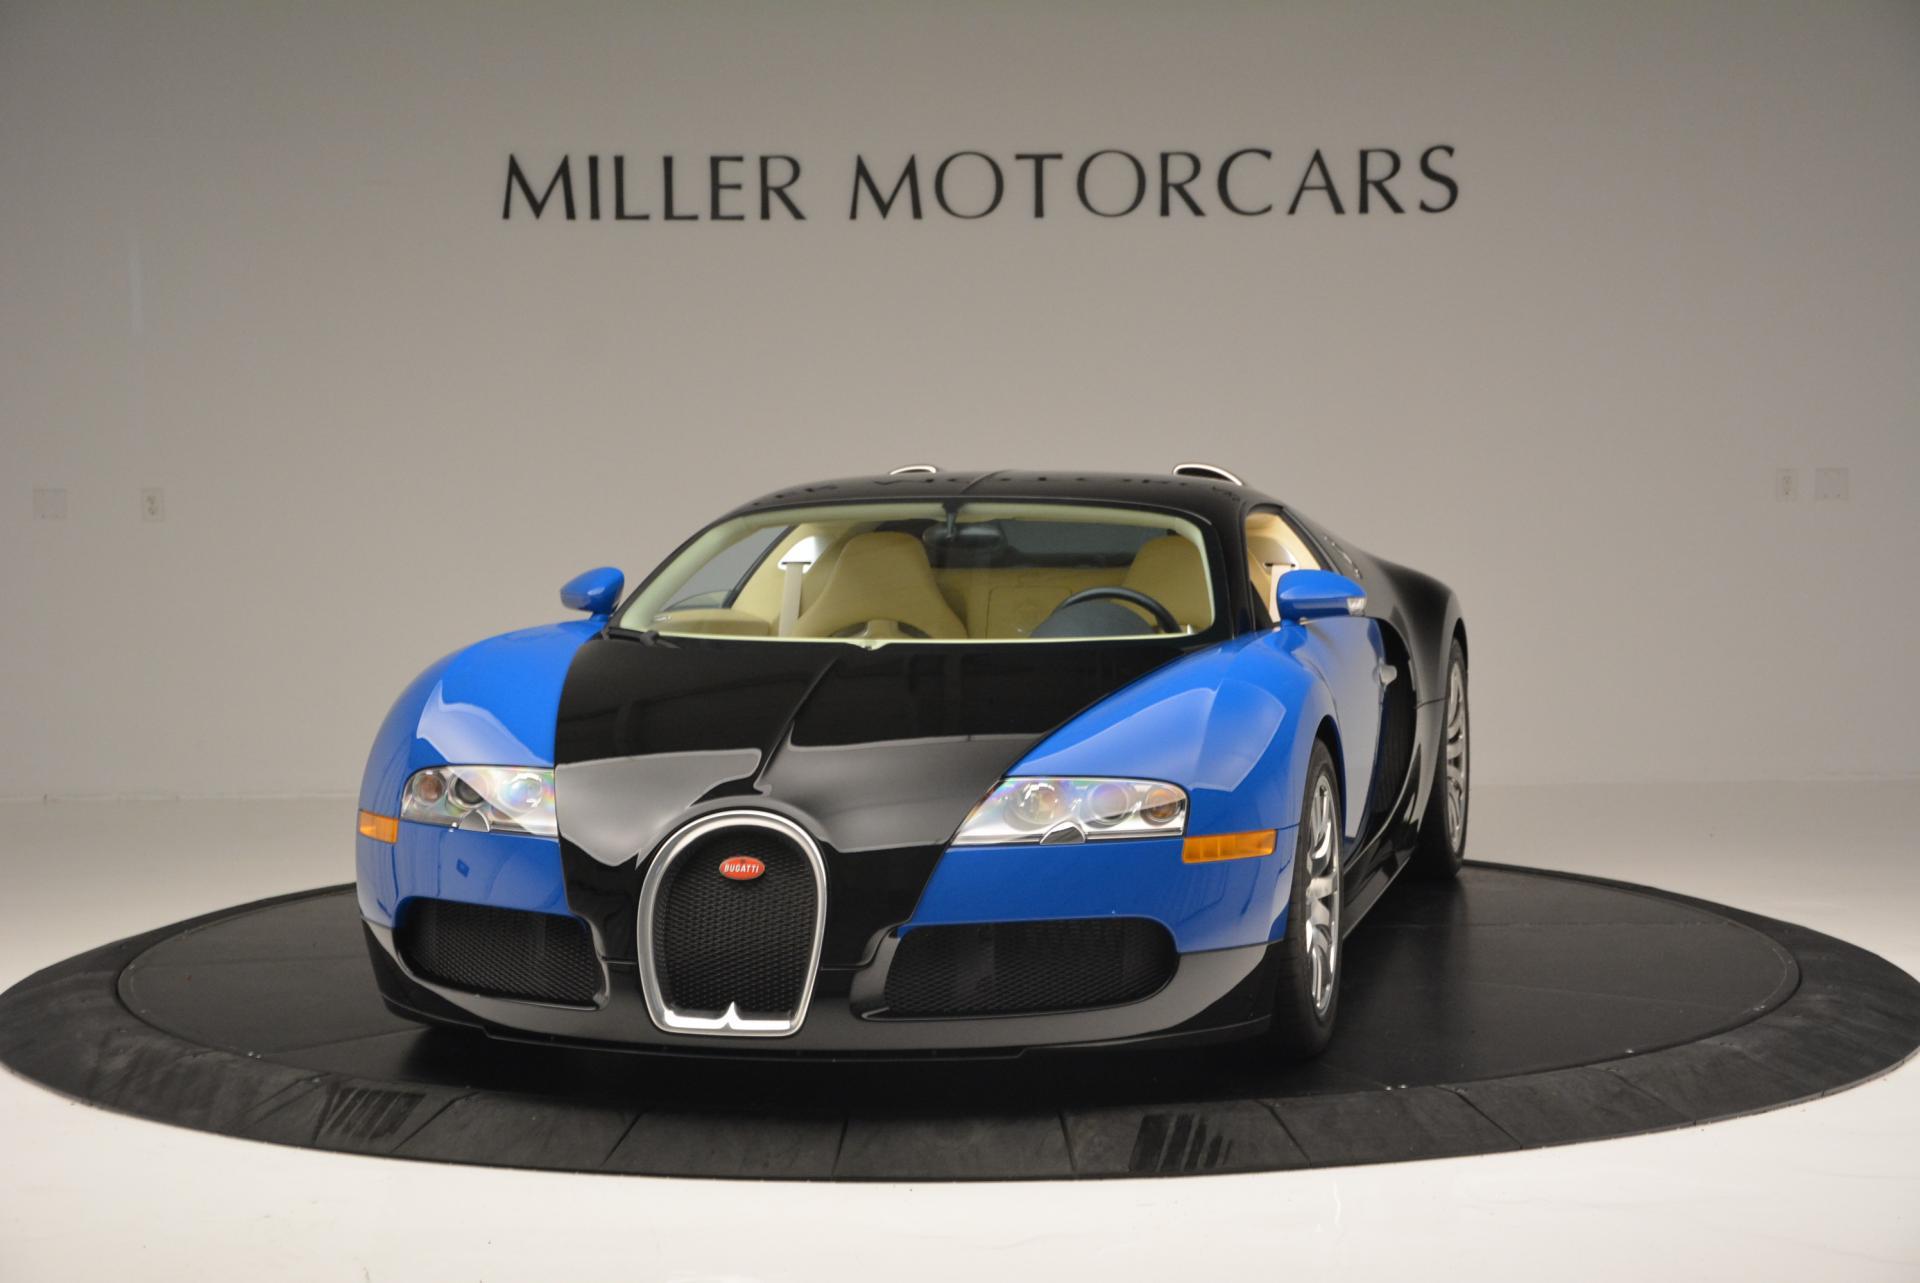 Used 2006 Bugatti Veyron 16.4  For Sale In Greenwich, CT. Alfa Romeo of Greenwich, 6725 43_main